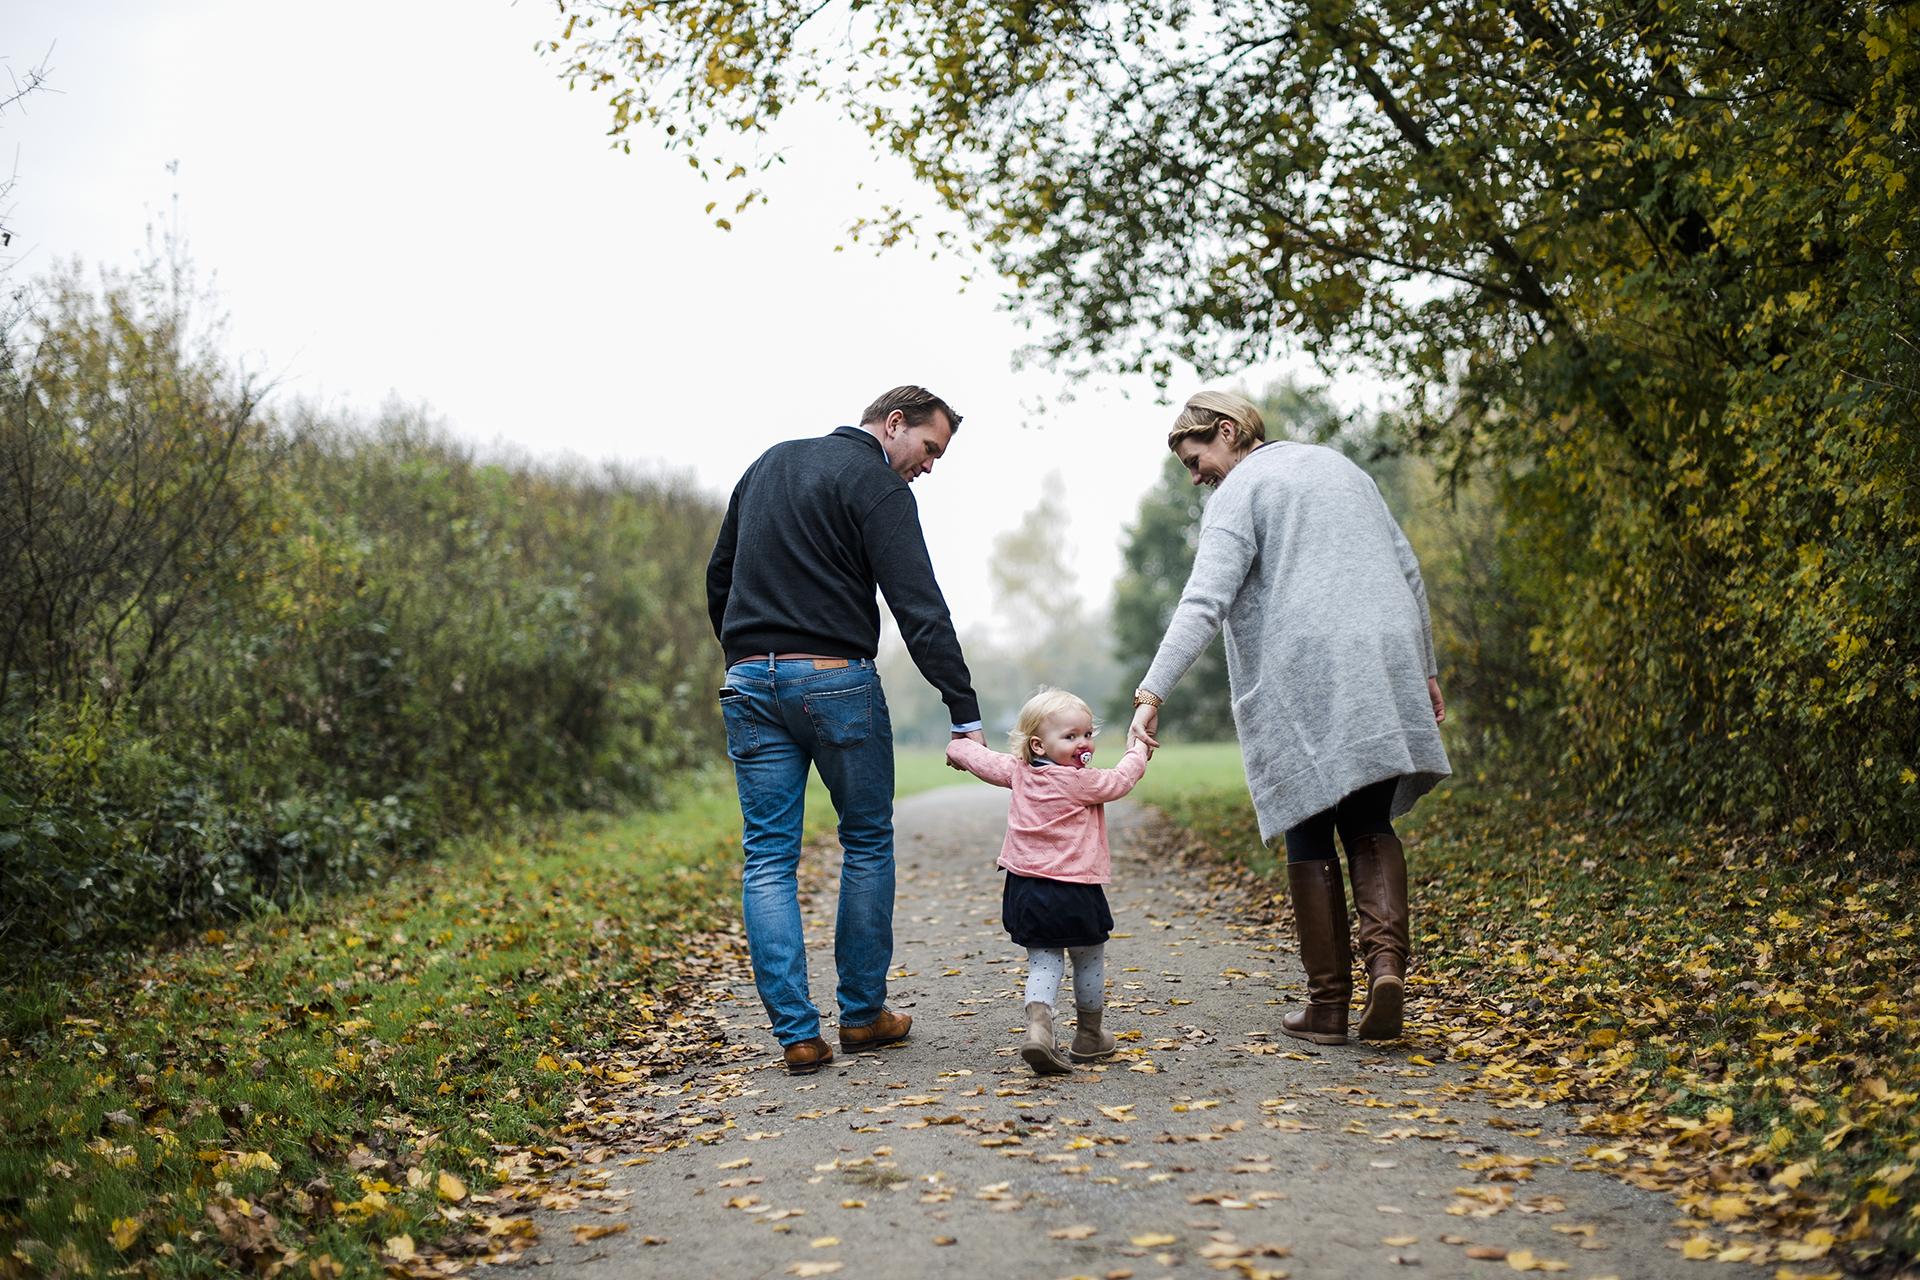 Familienshooting_FF_020_Caroline Queda Fotografie